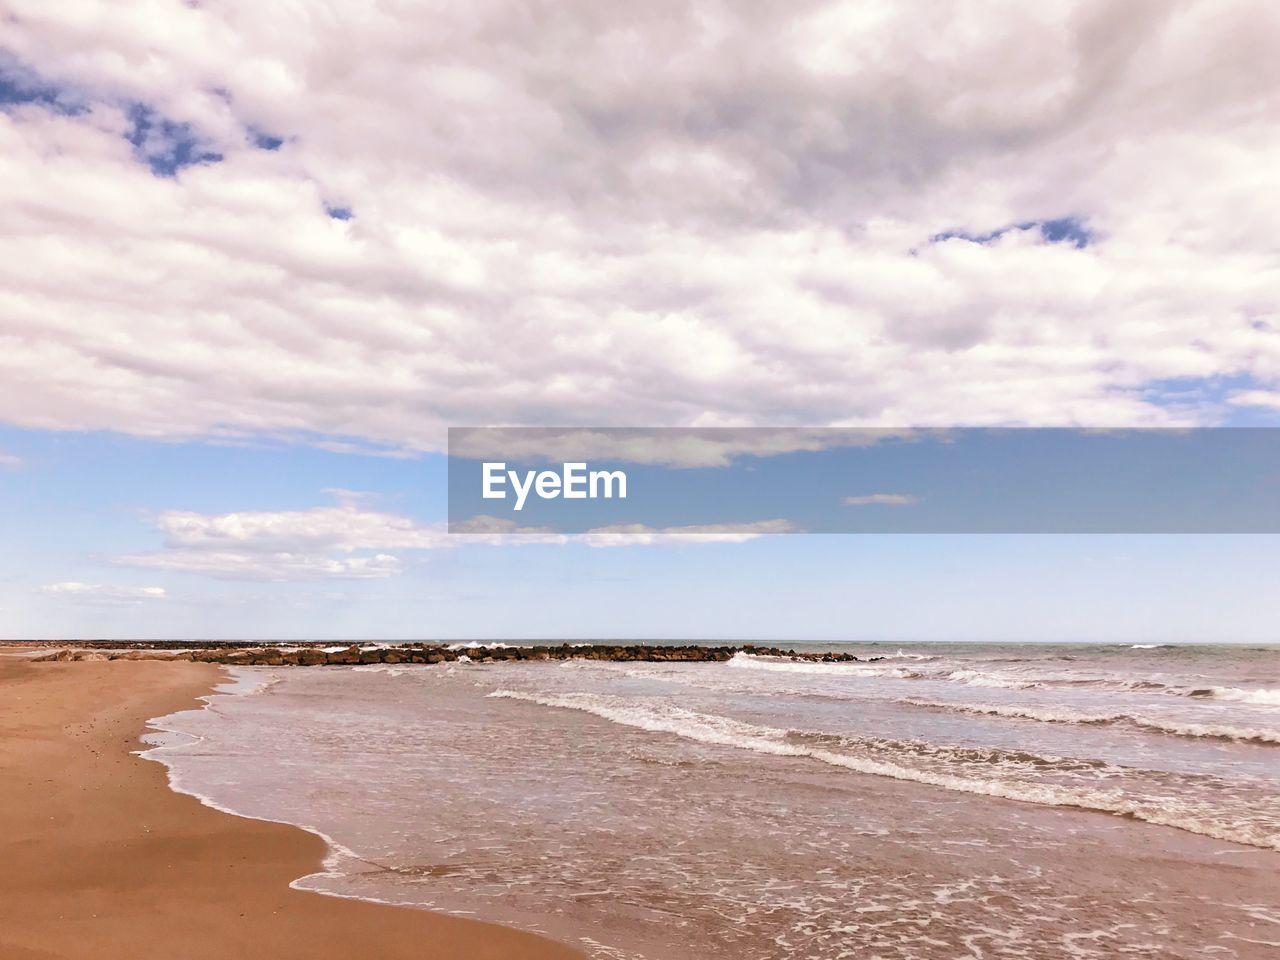 sky, cloud - sky, sea, water, land, beach, beauty in nature, scenics - nature, horizon, tranquility, tranquil scene, nature, horizon over water, day, no people, sand, non-urban scene, sport, outdoors, salt flat